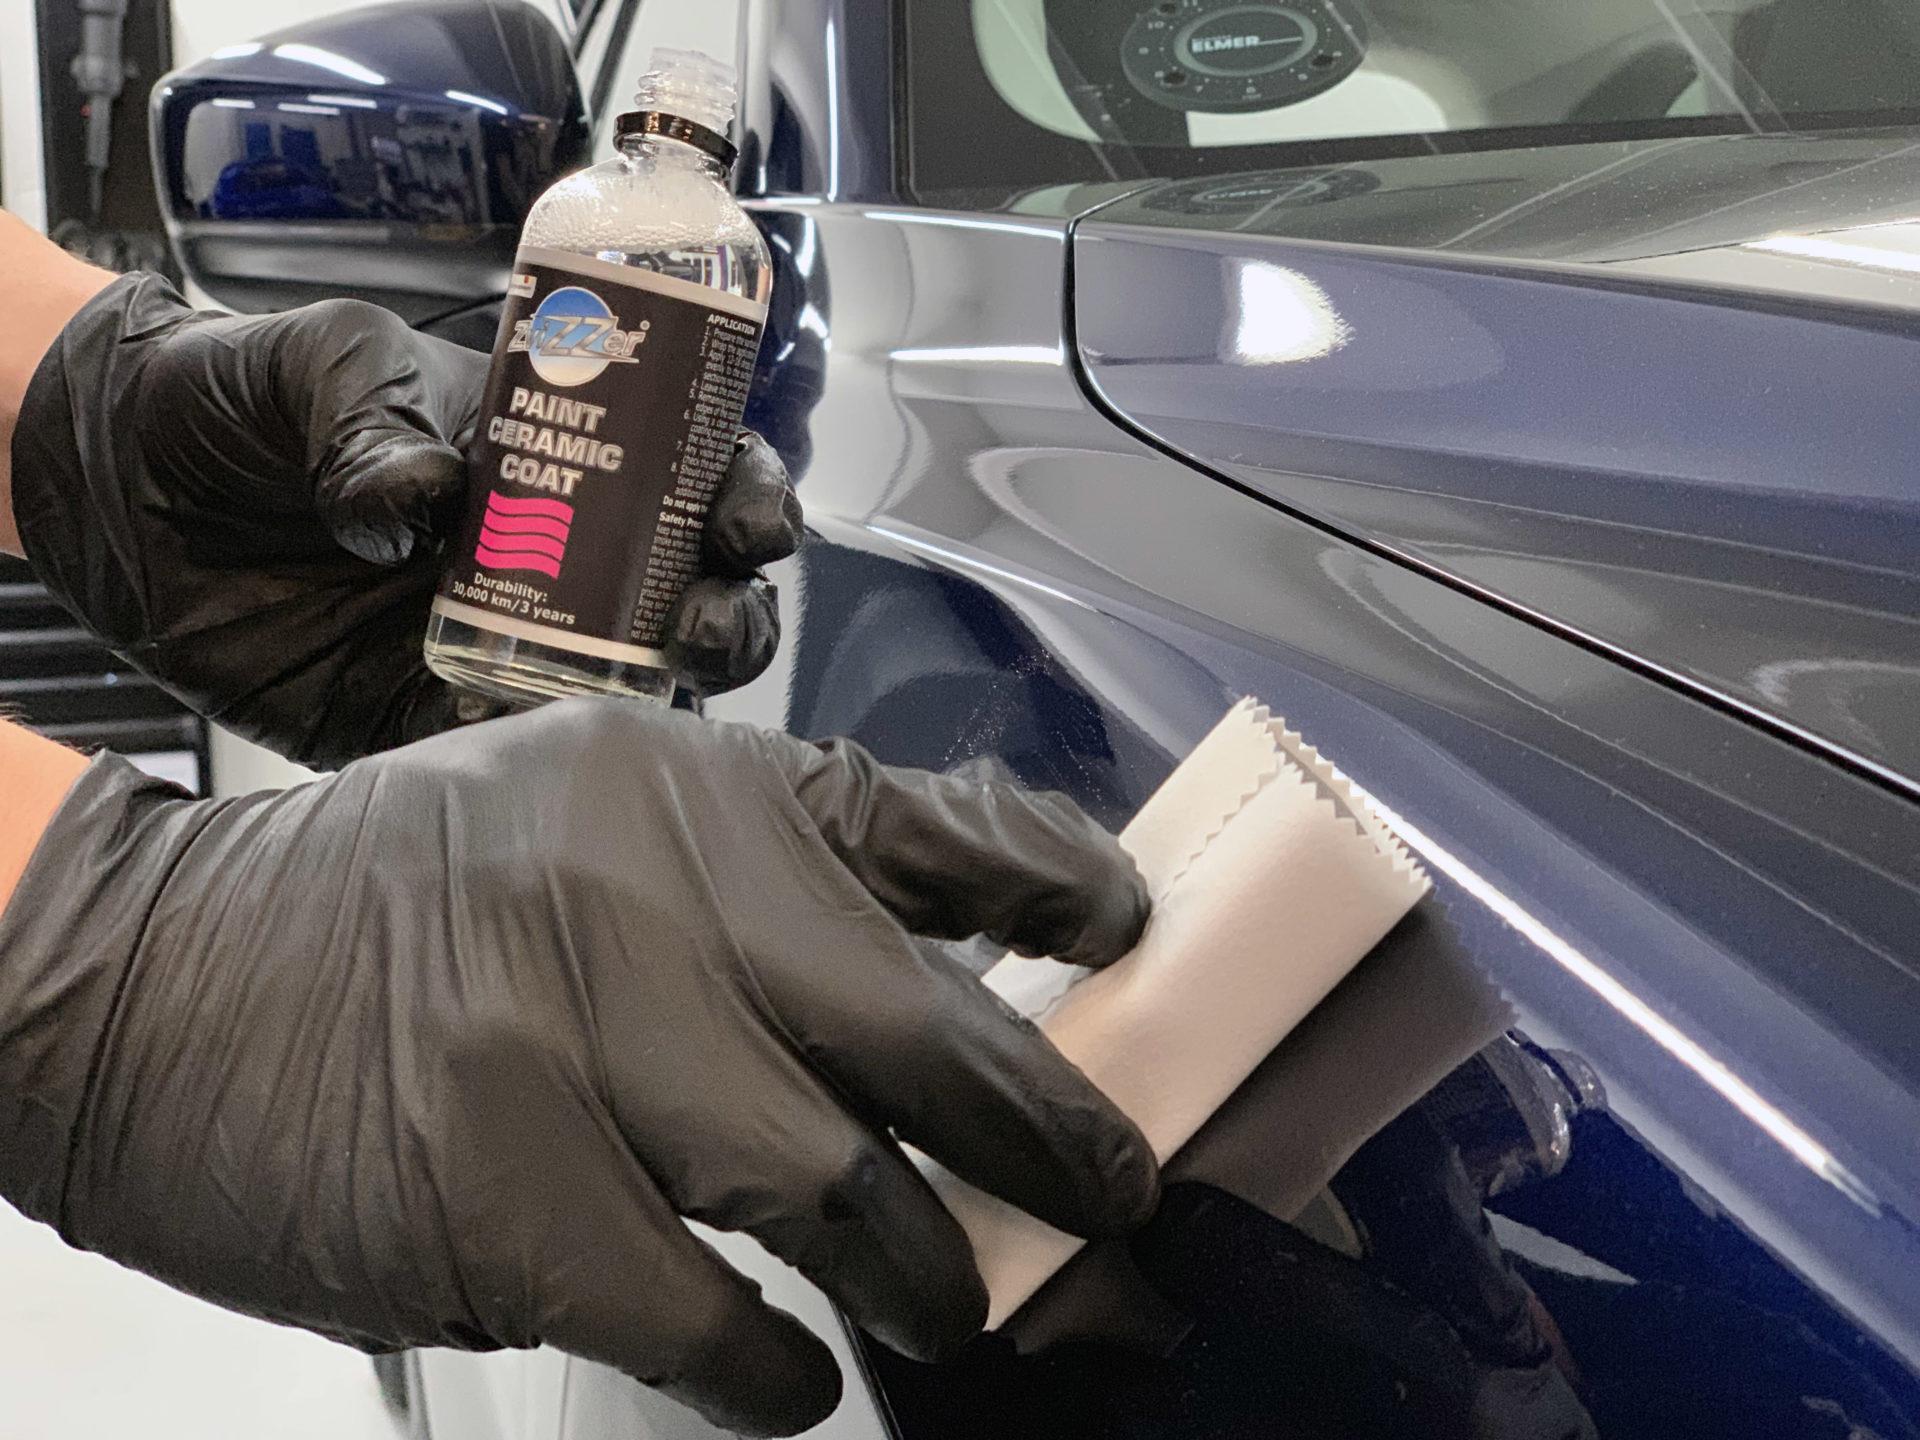 Ceramic Pro - Verdens hårdeste coating!